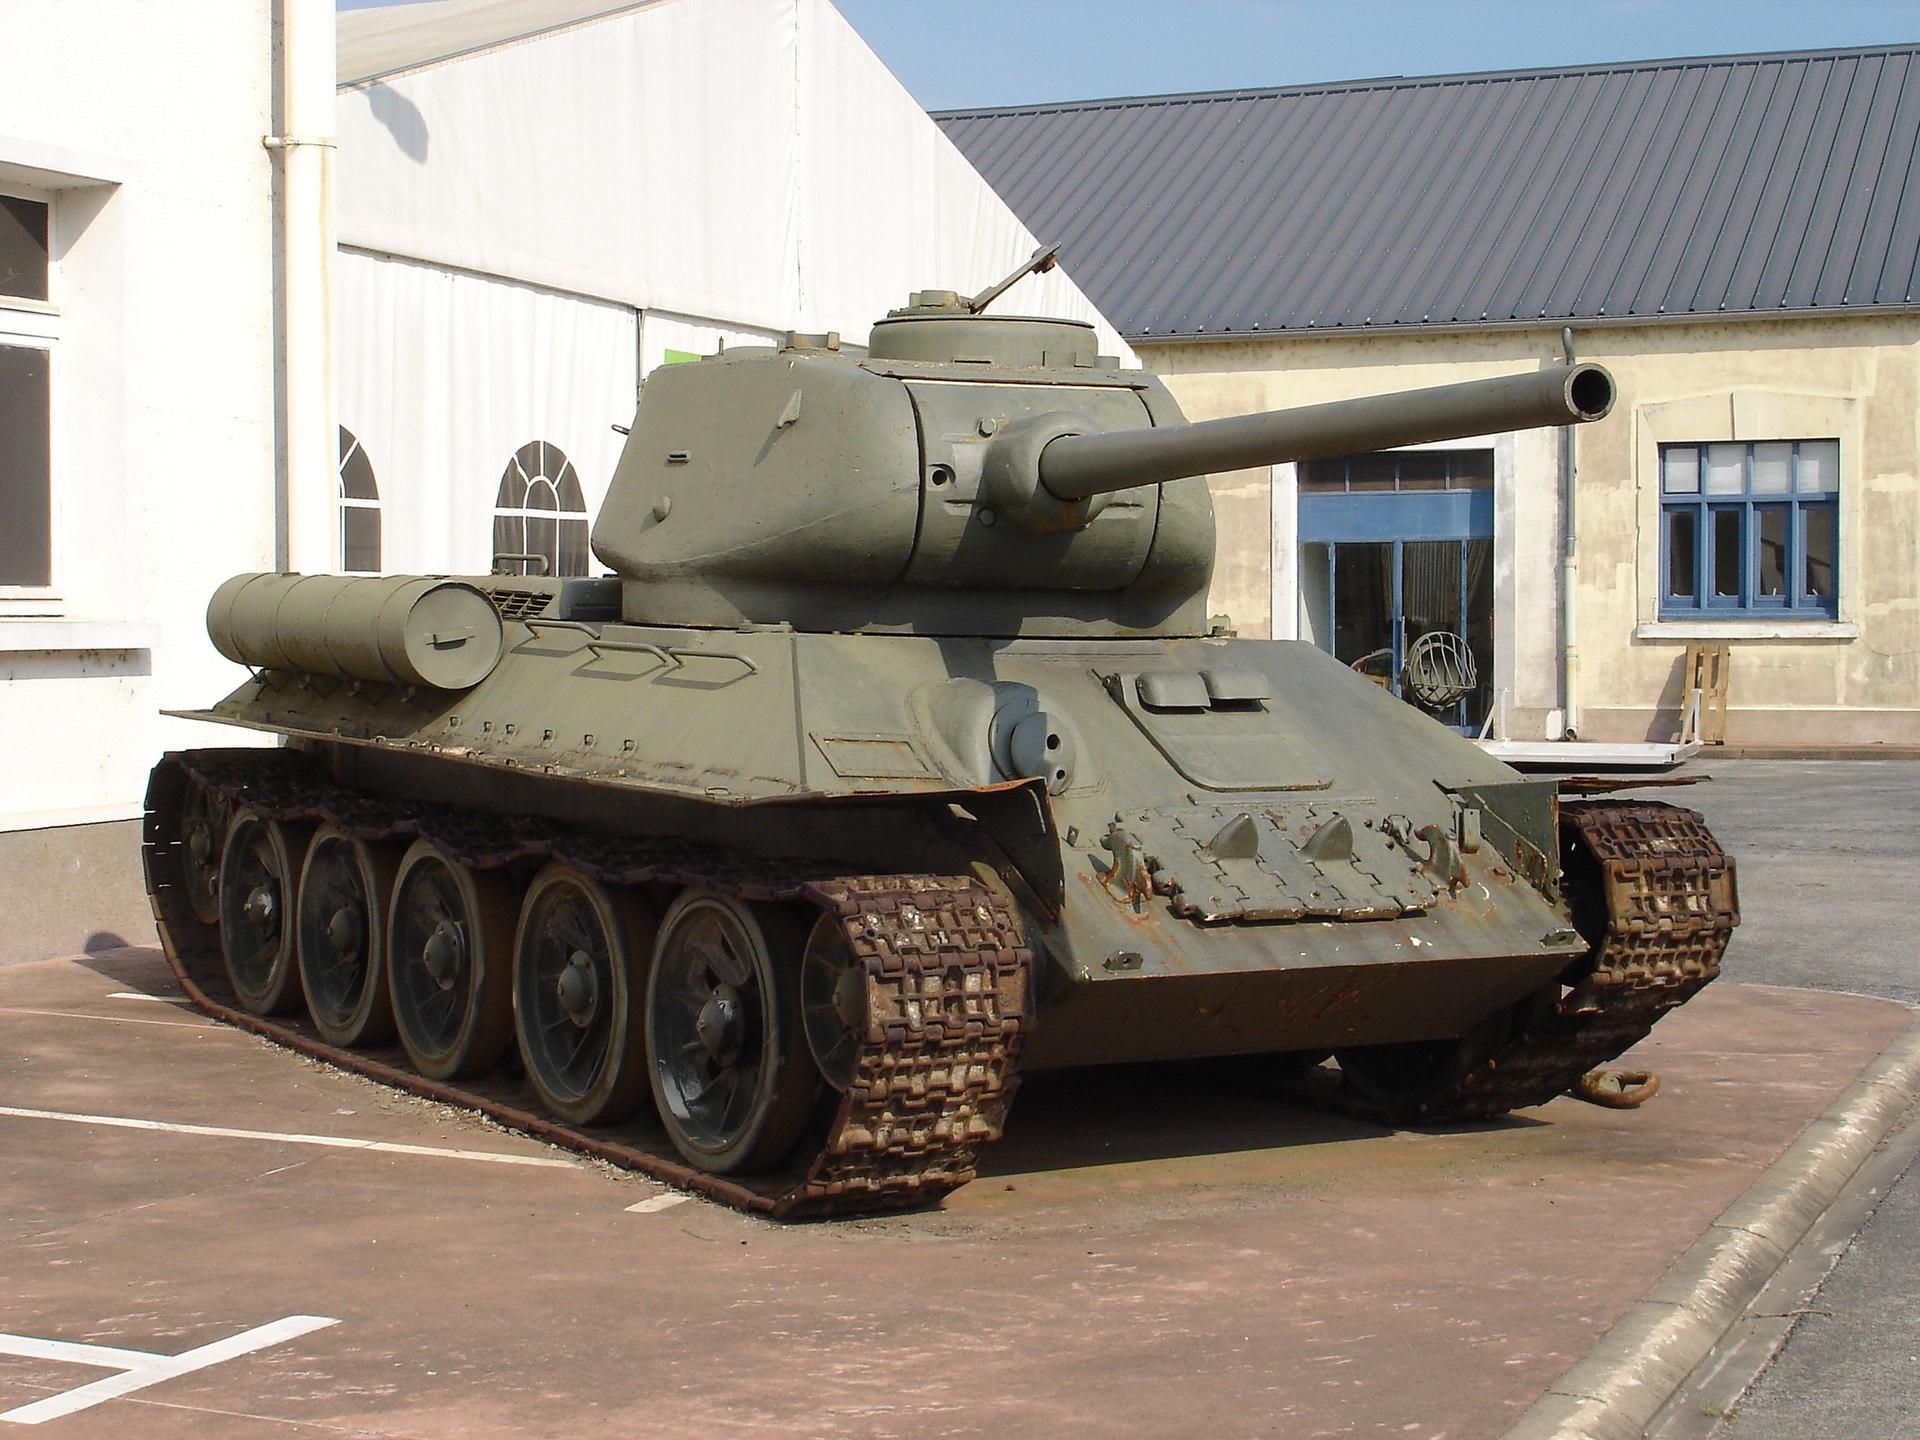 A T-34-85 tank on display at the Musée des Blindés in Saumur, April 2007